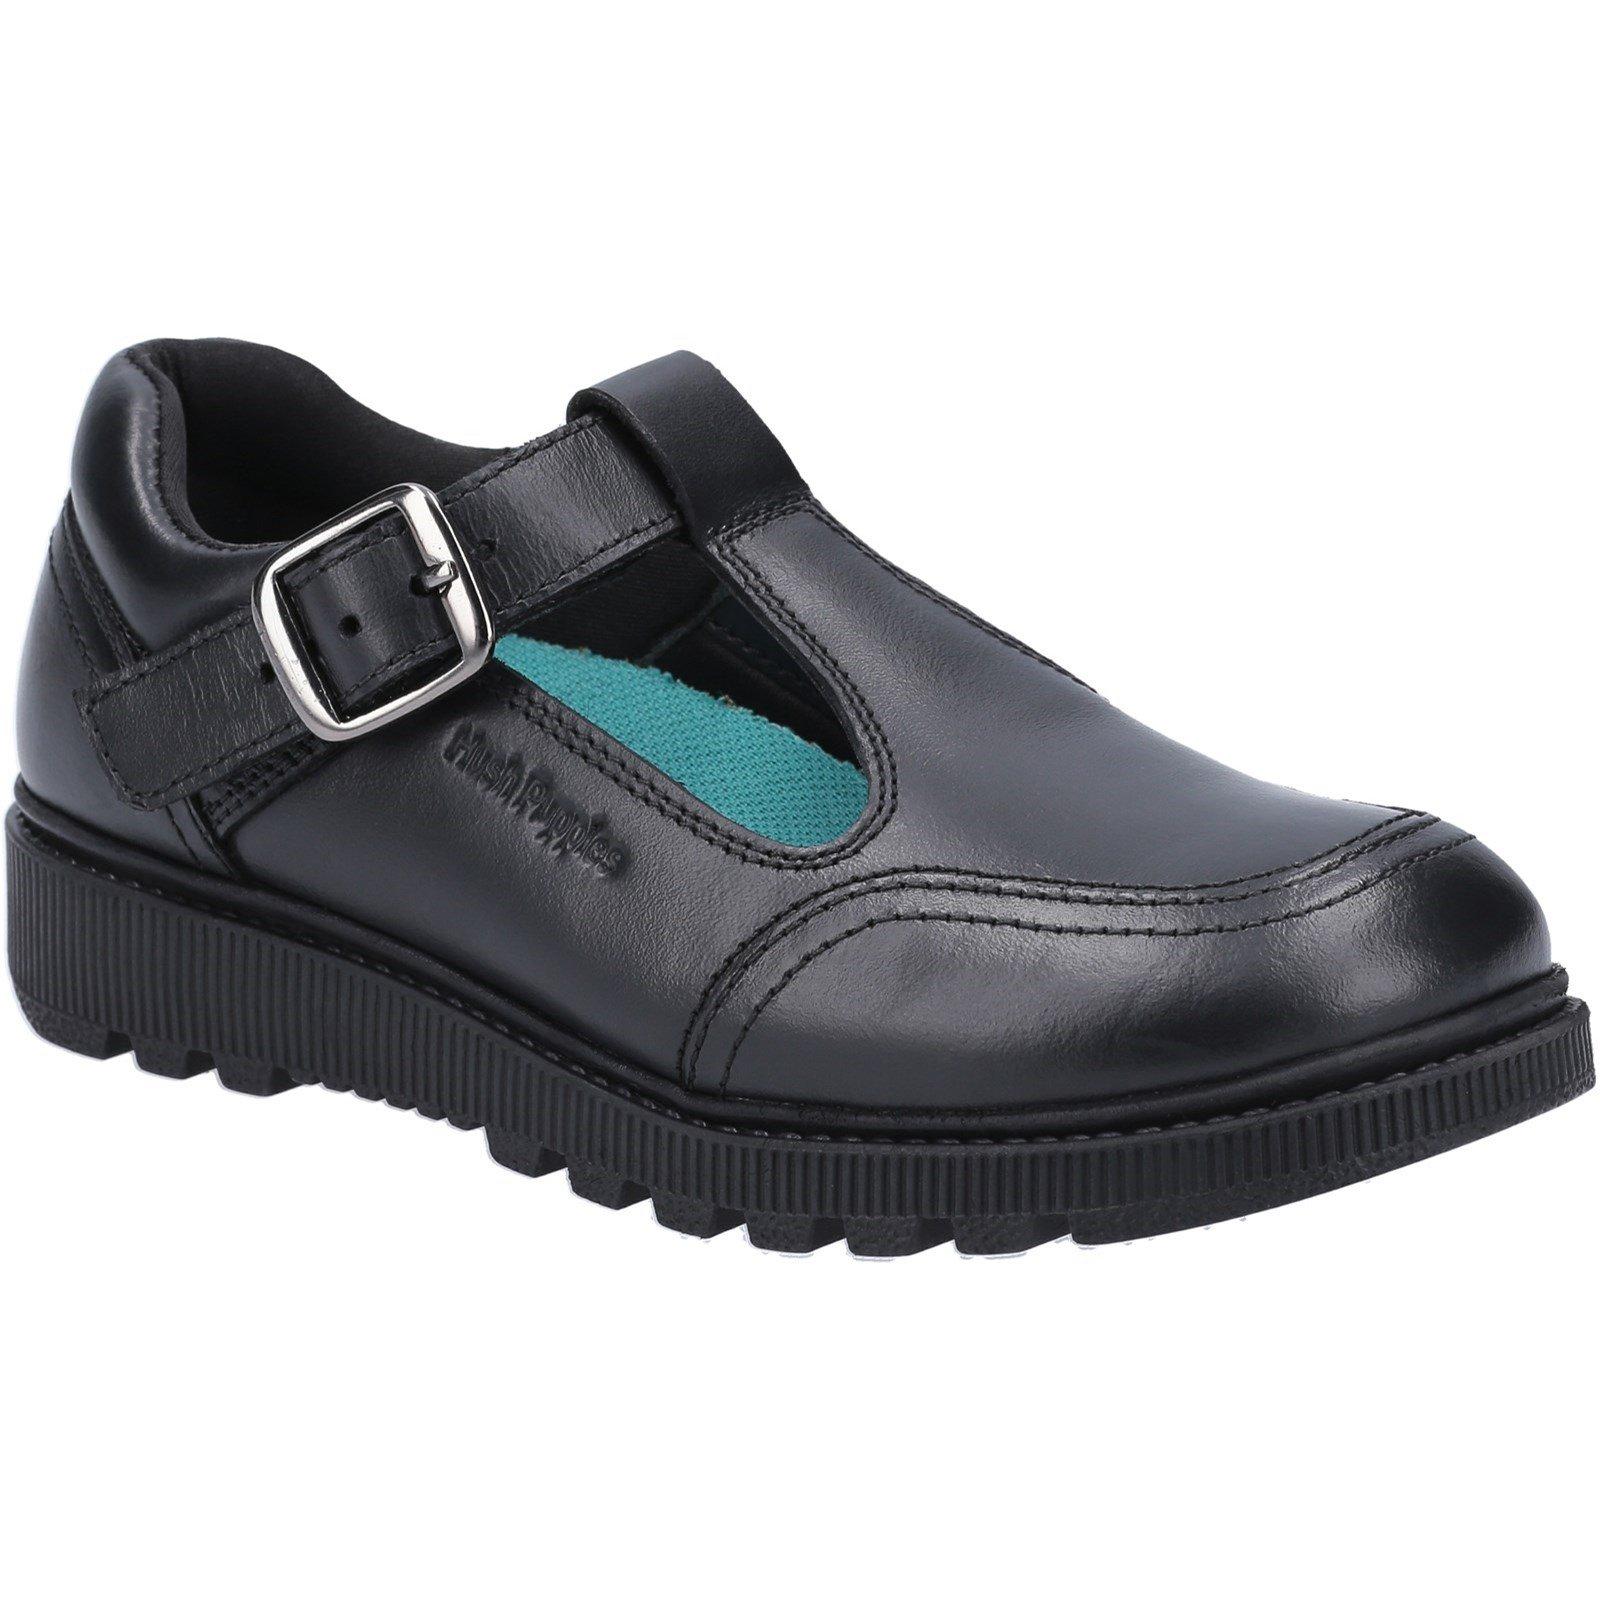 Hush Puppies Kid's Kerry Senior School Shoe Black 30818 - Black 3